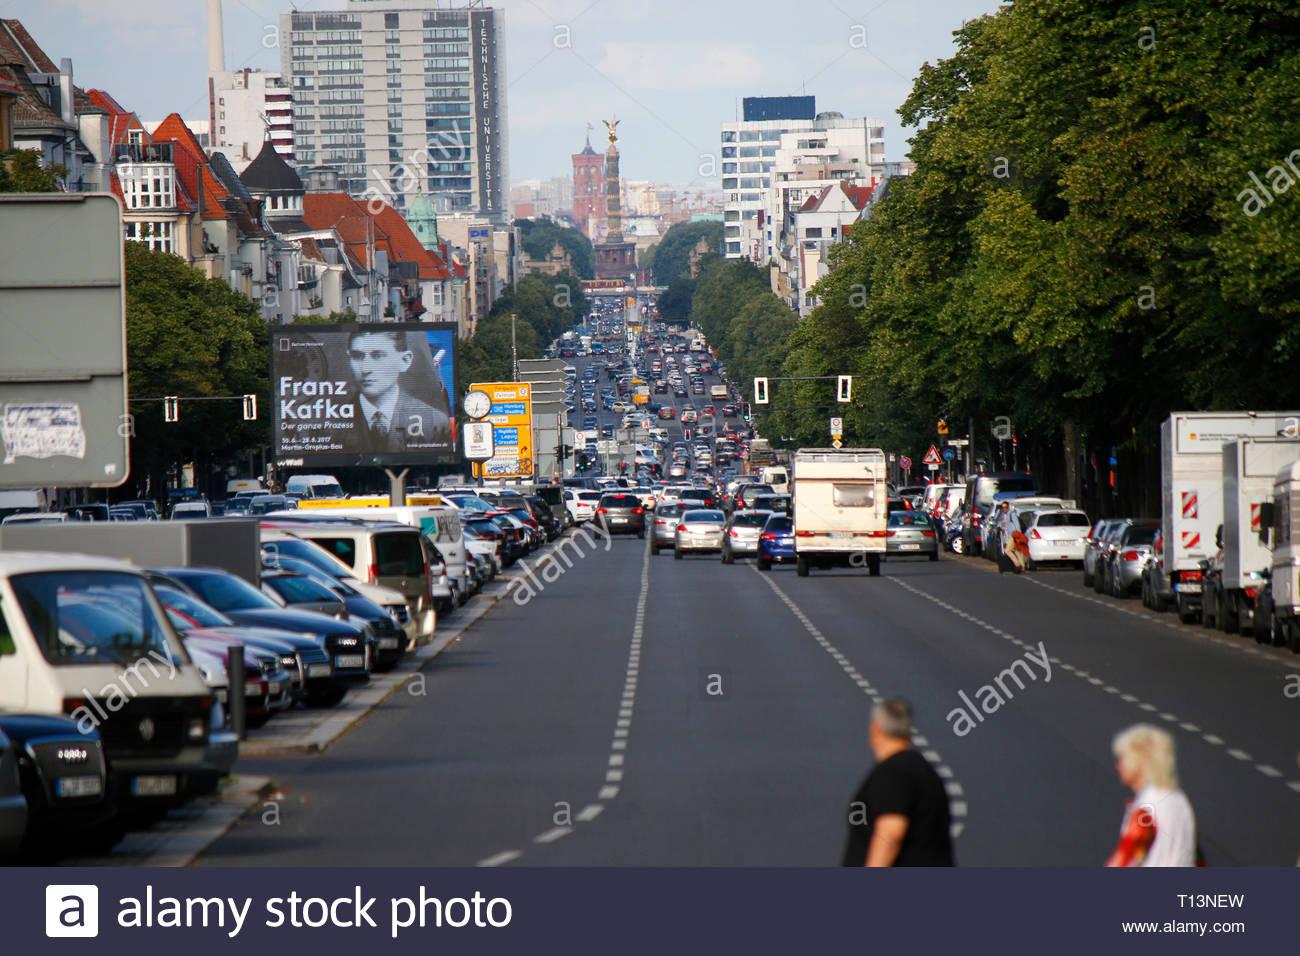 Fussgaenger, Strassenverkehr, Heerstrasse, Berlin-Charlottenburg. - Stock Image